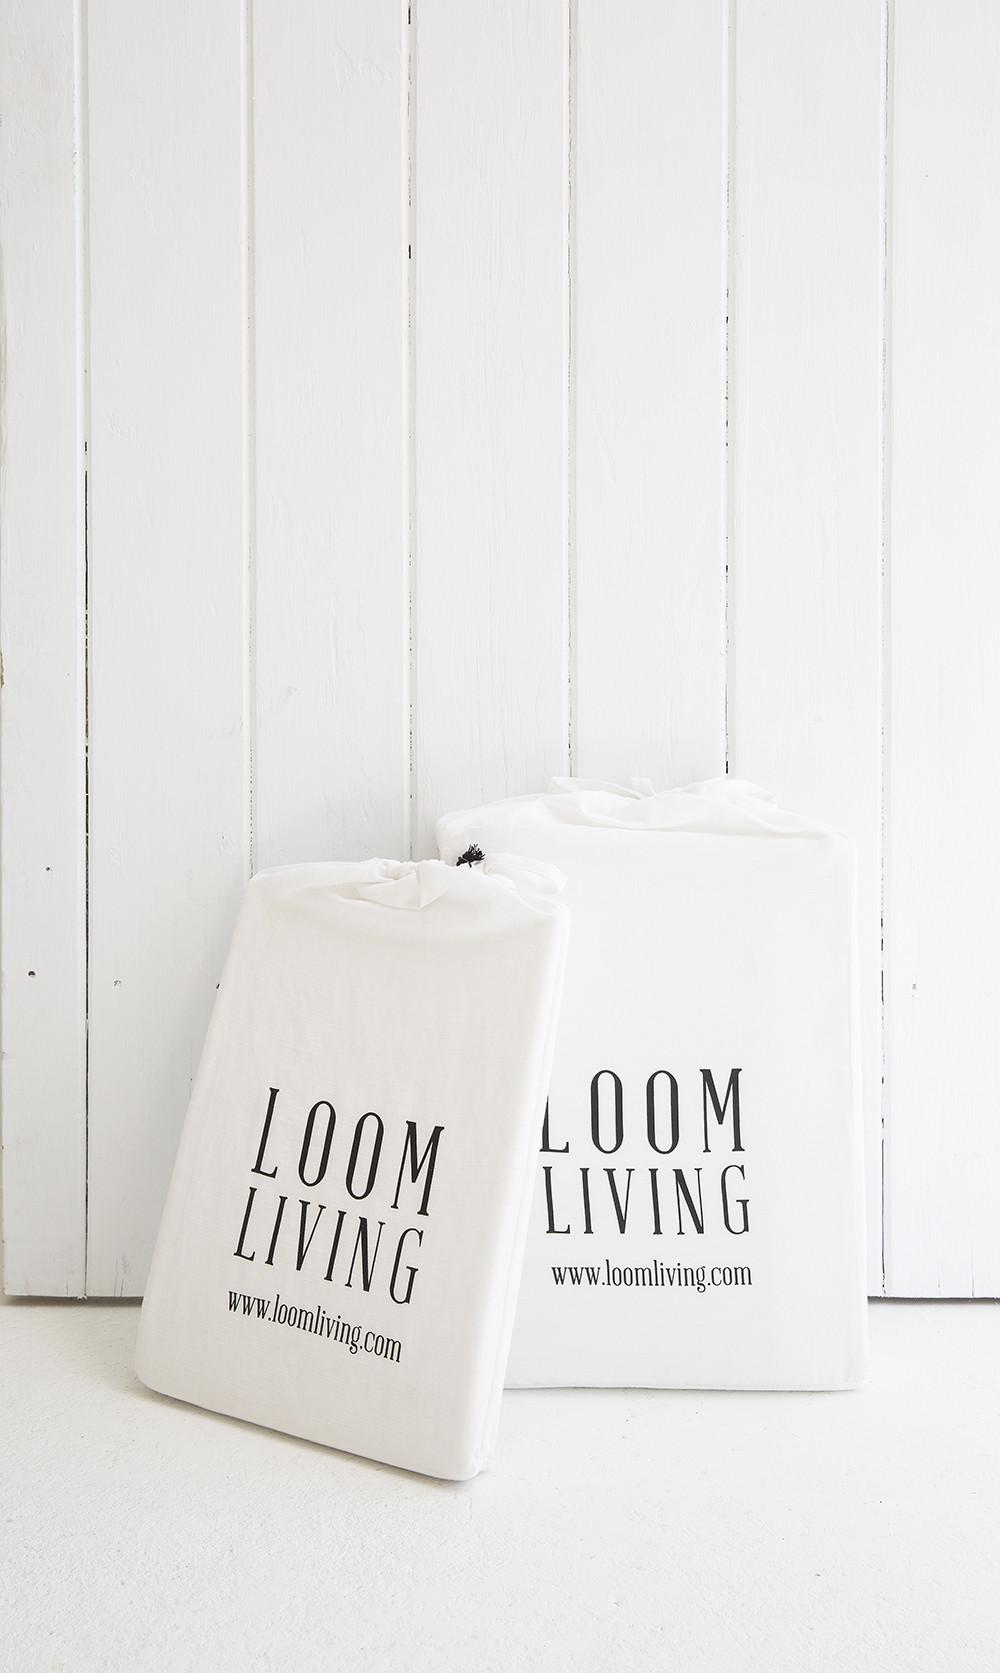 Loom Living Image